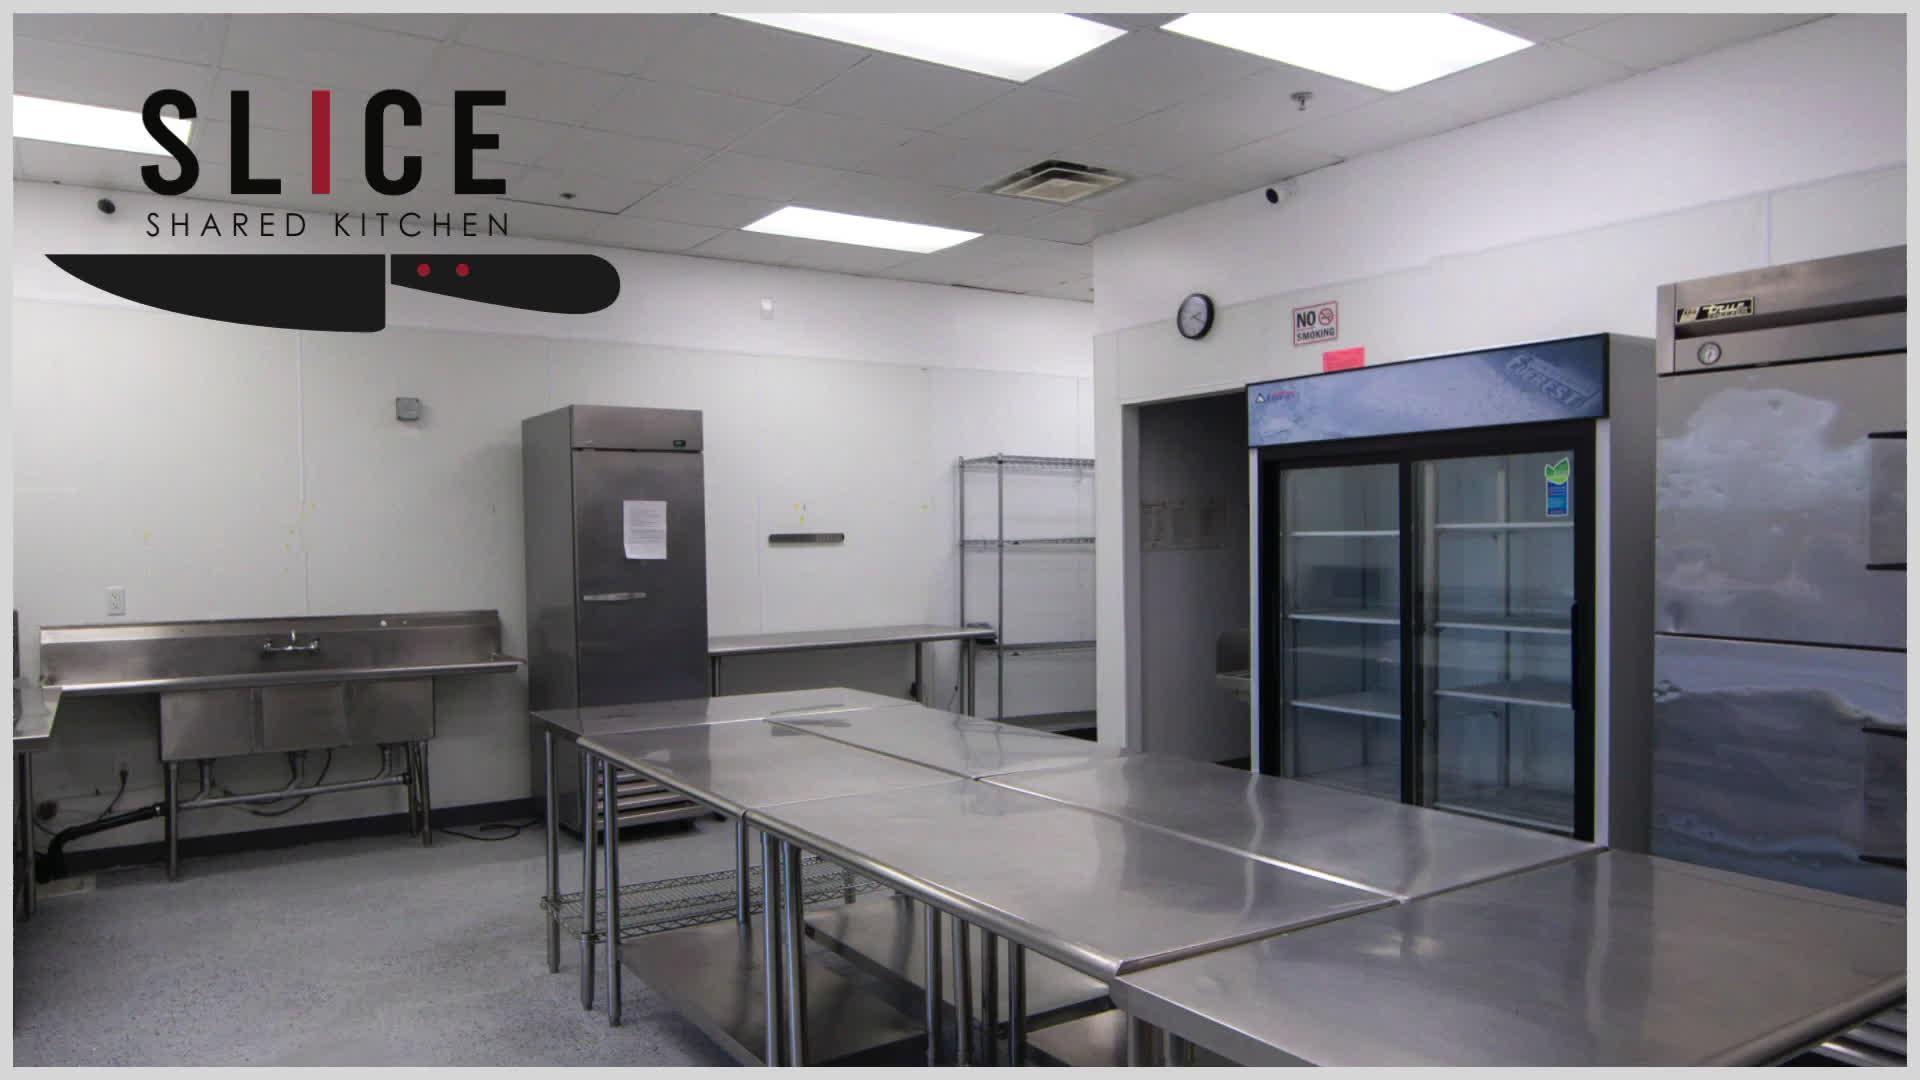 Slice Shared Kitchen 1080 062920 (1).mp4